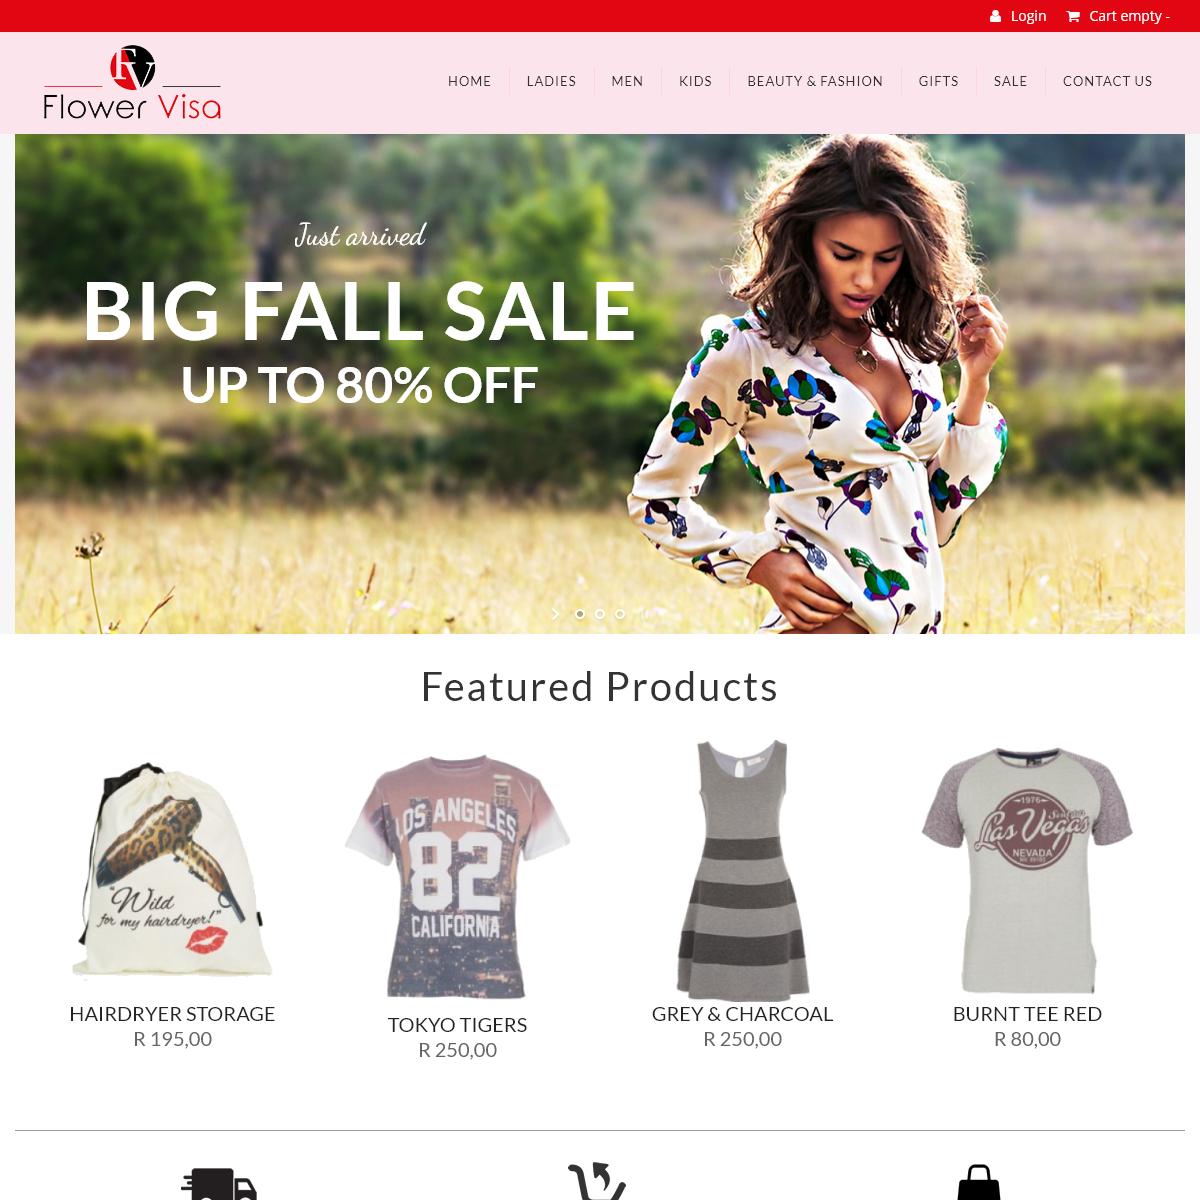 Online Fashion Shop- Flower Visa